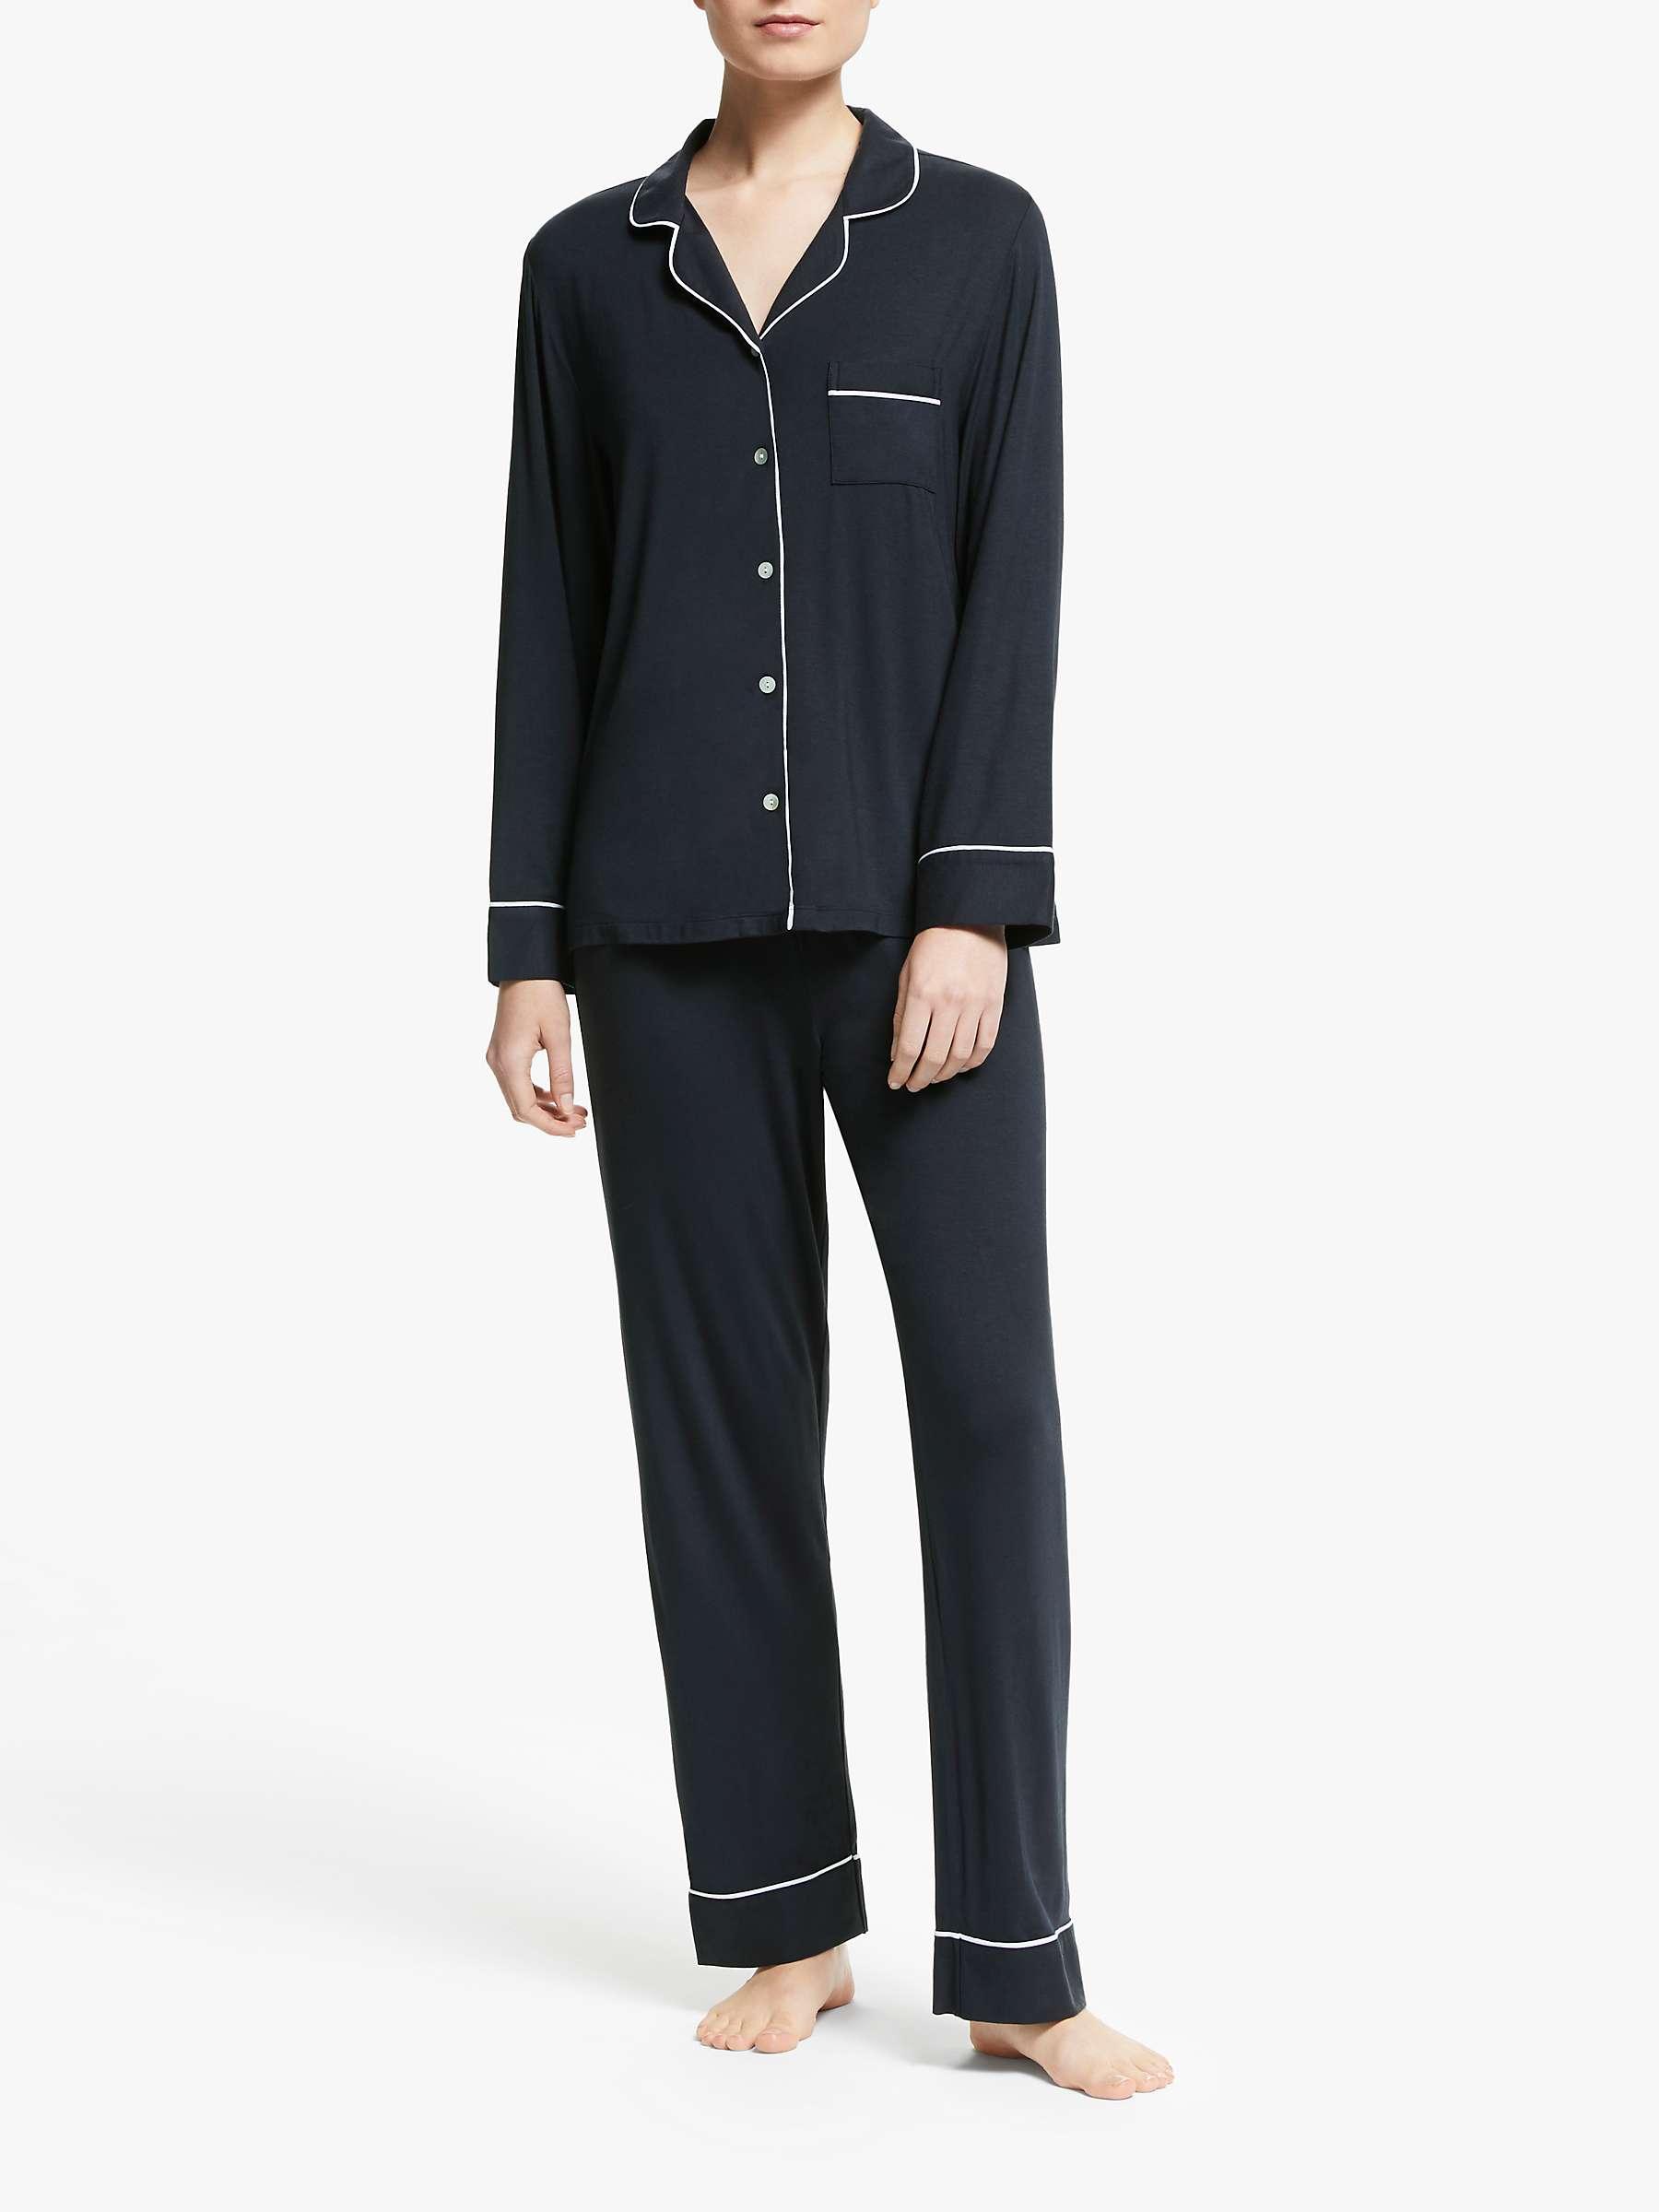 Aria Modal Pyjama Set - John Lewis